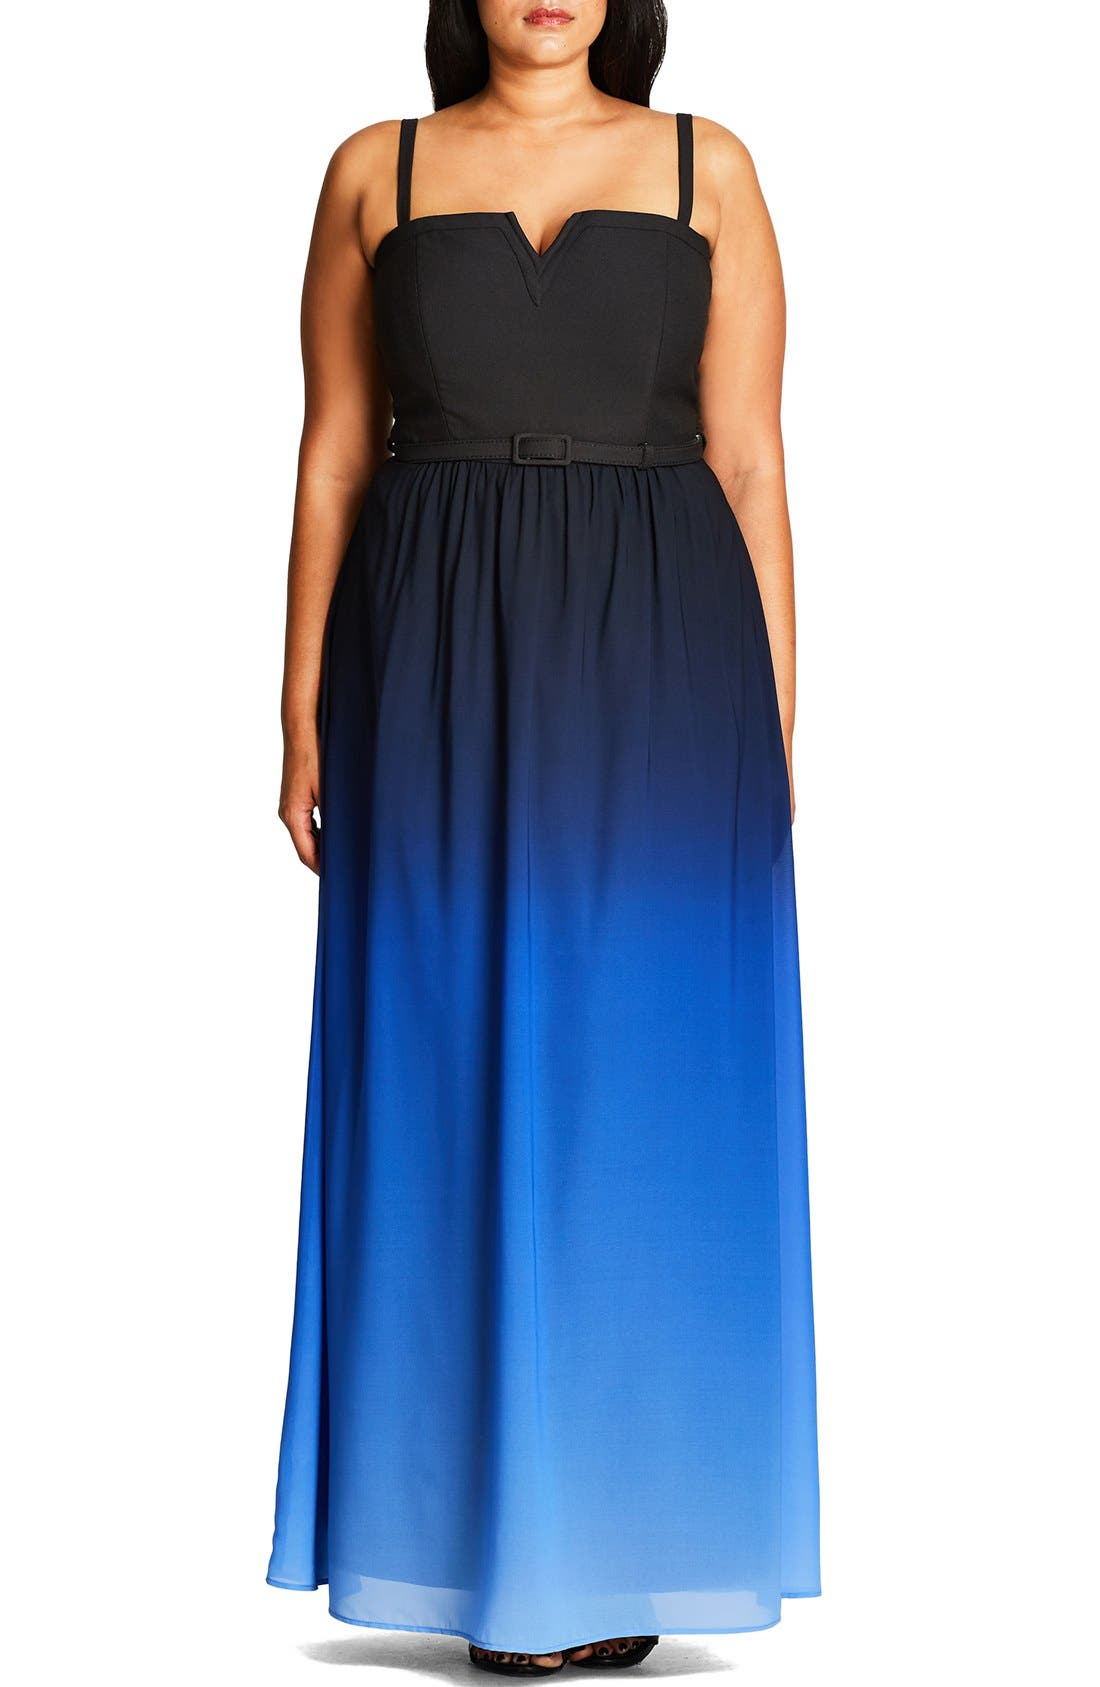 CITY CHIC 'Ombré Queen' Notch Neck Maxi Dress